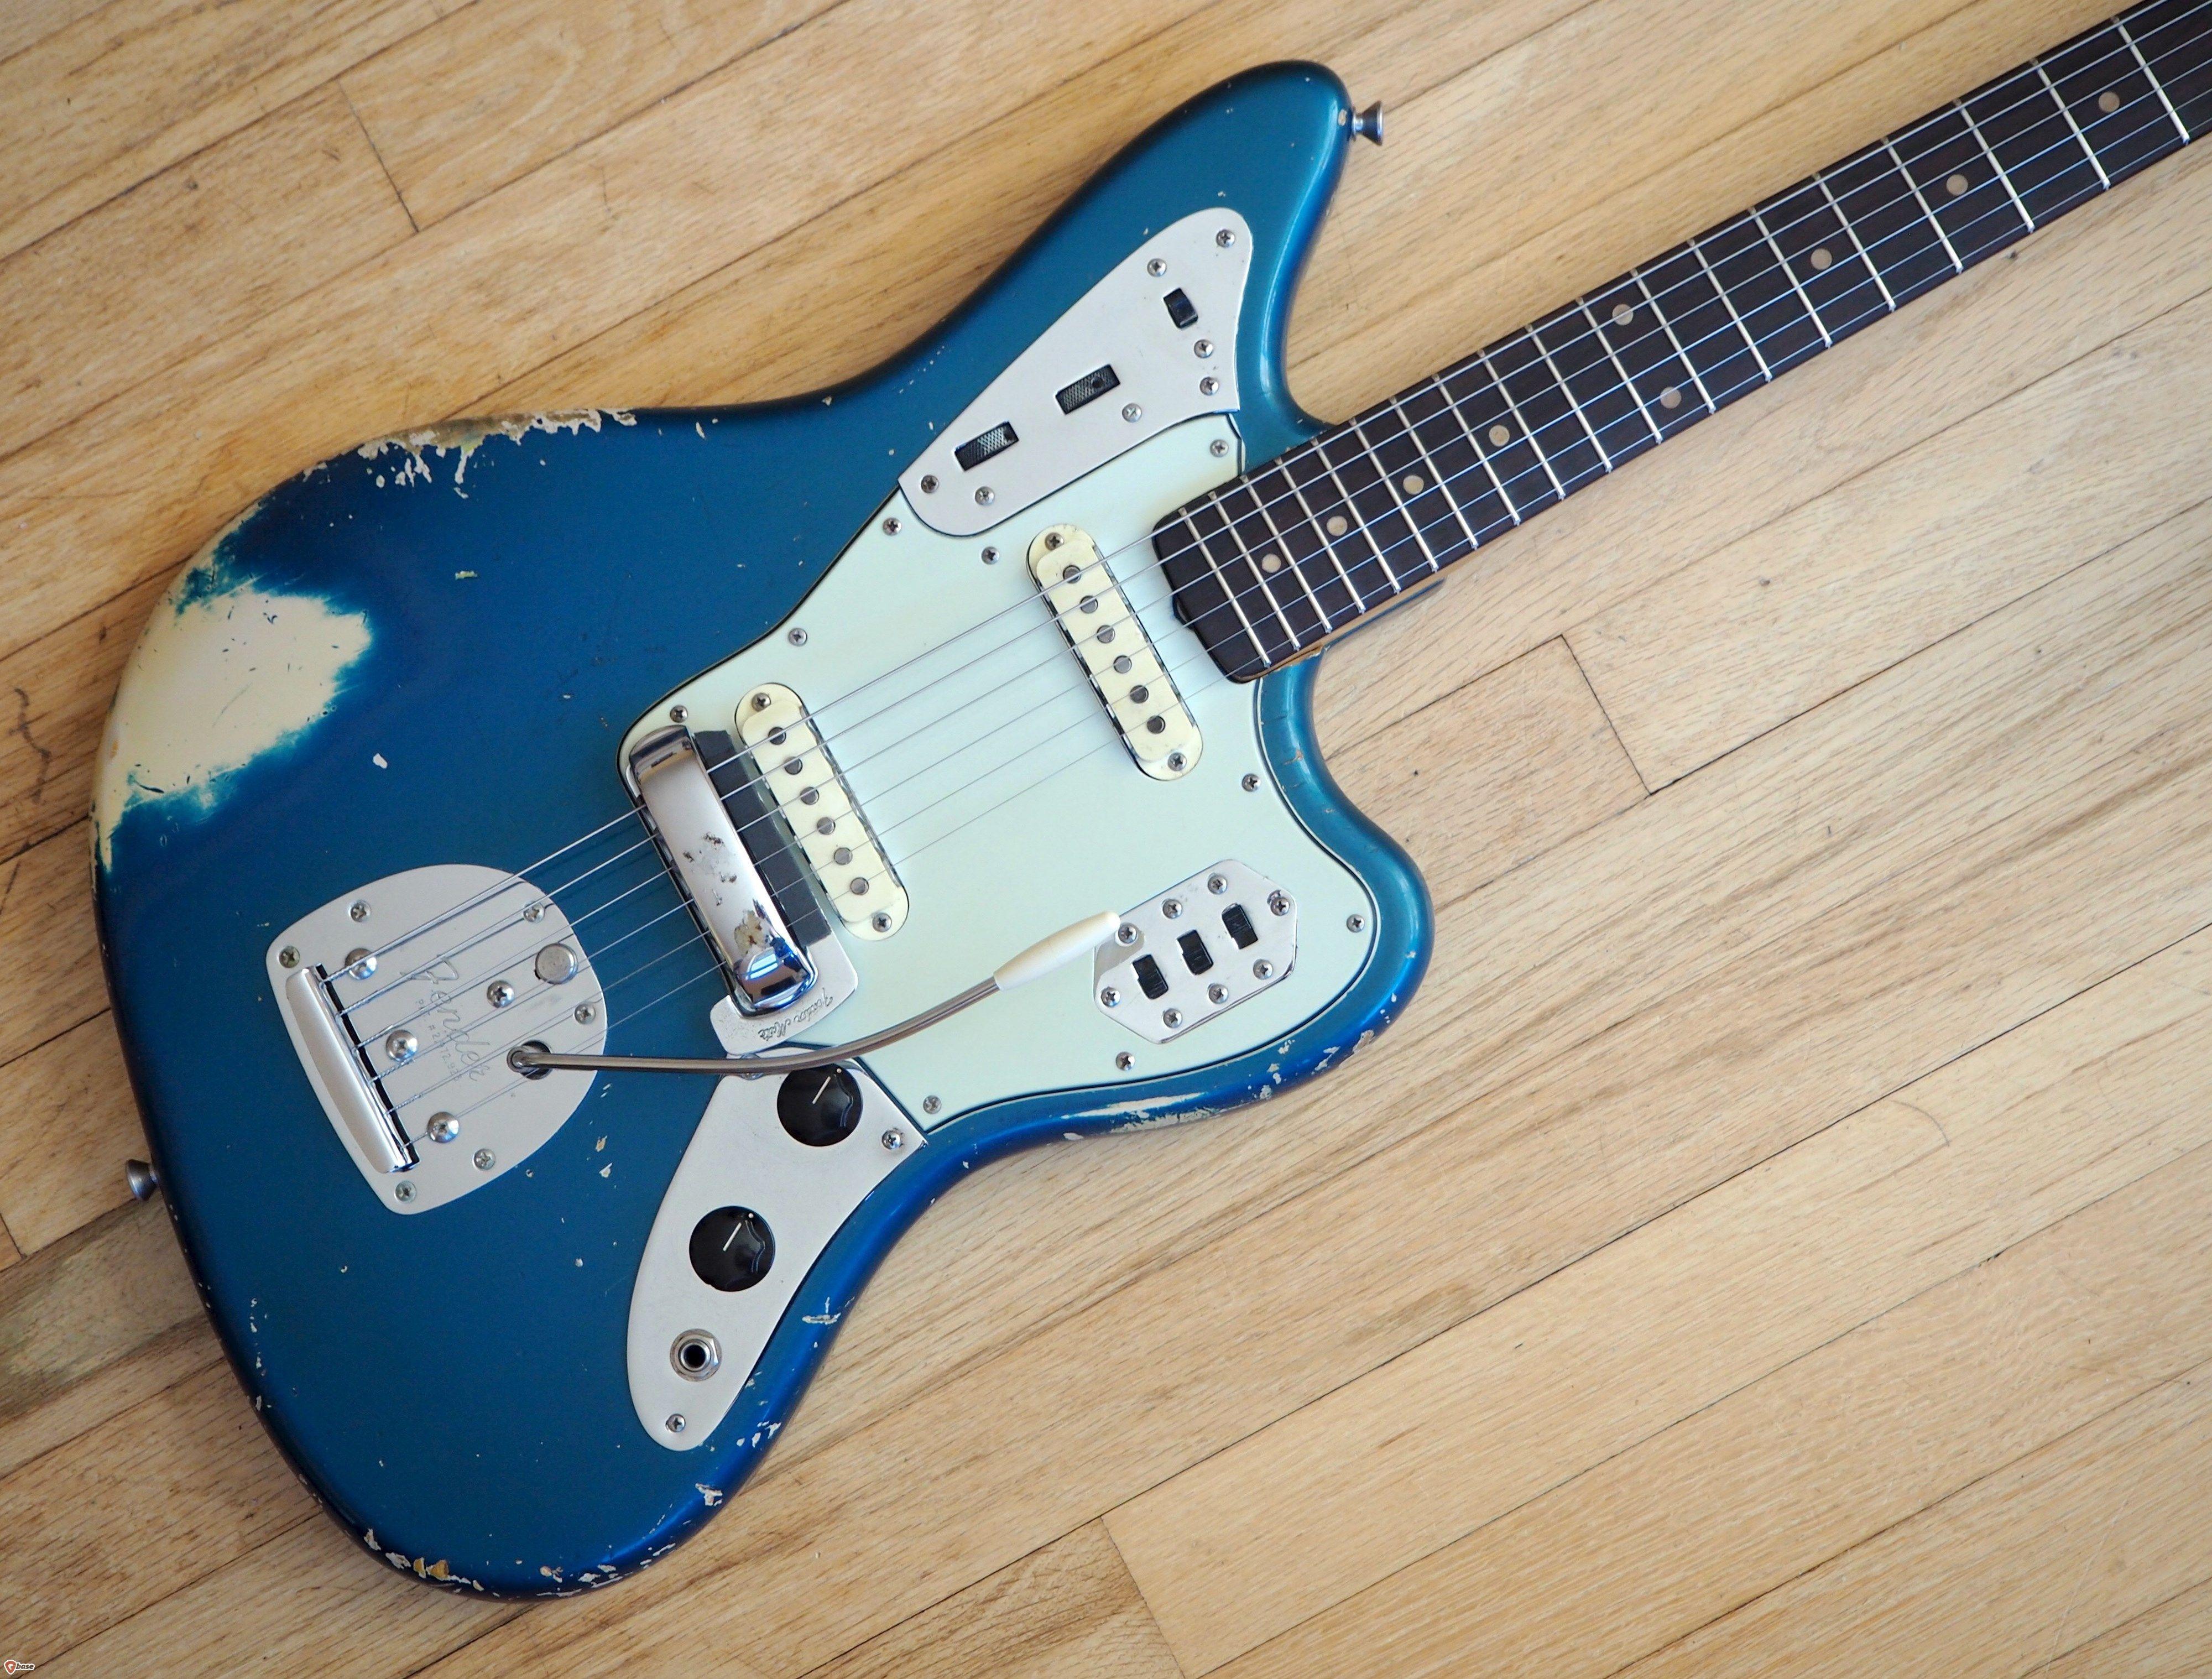 electric us gtr marr jaguar guitars for en fender white johnny nr product olympic cntbdyright sale